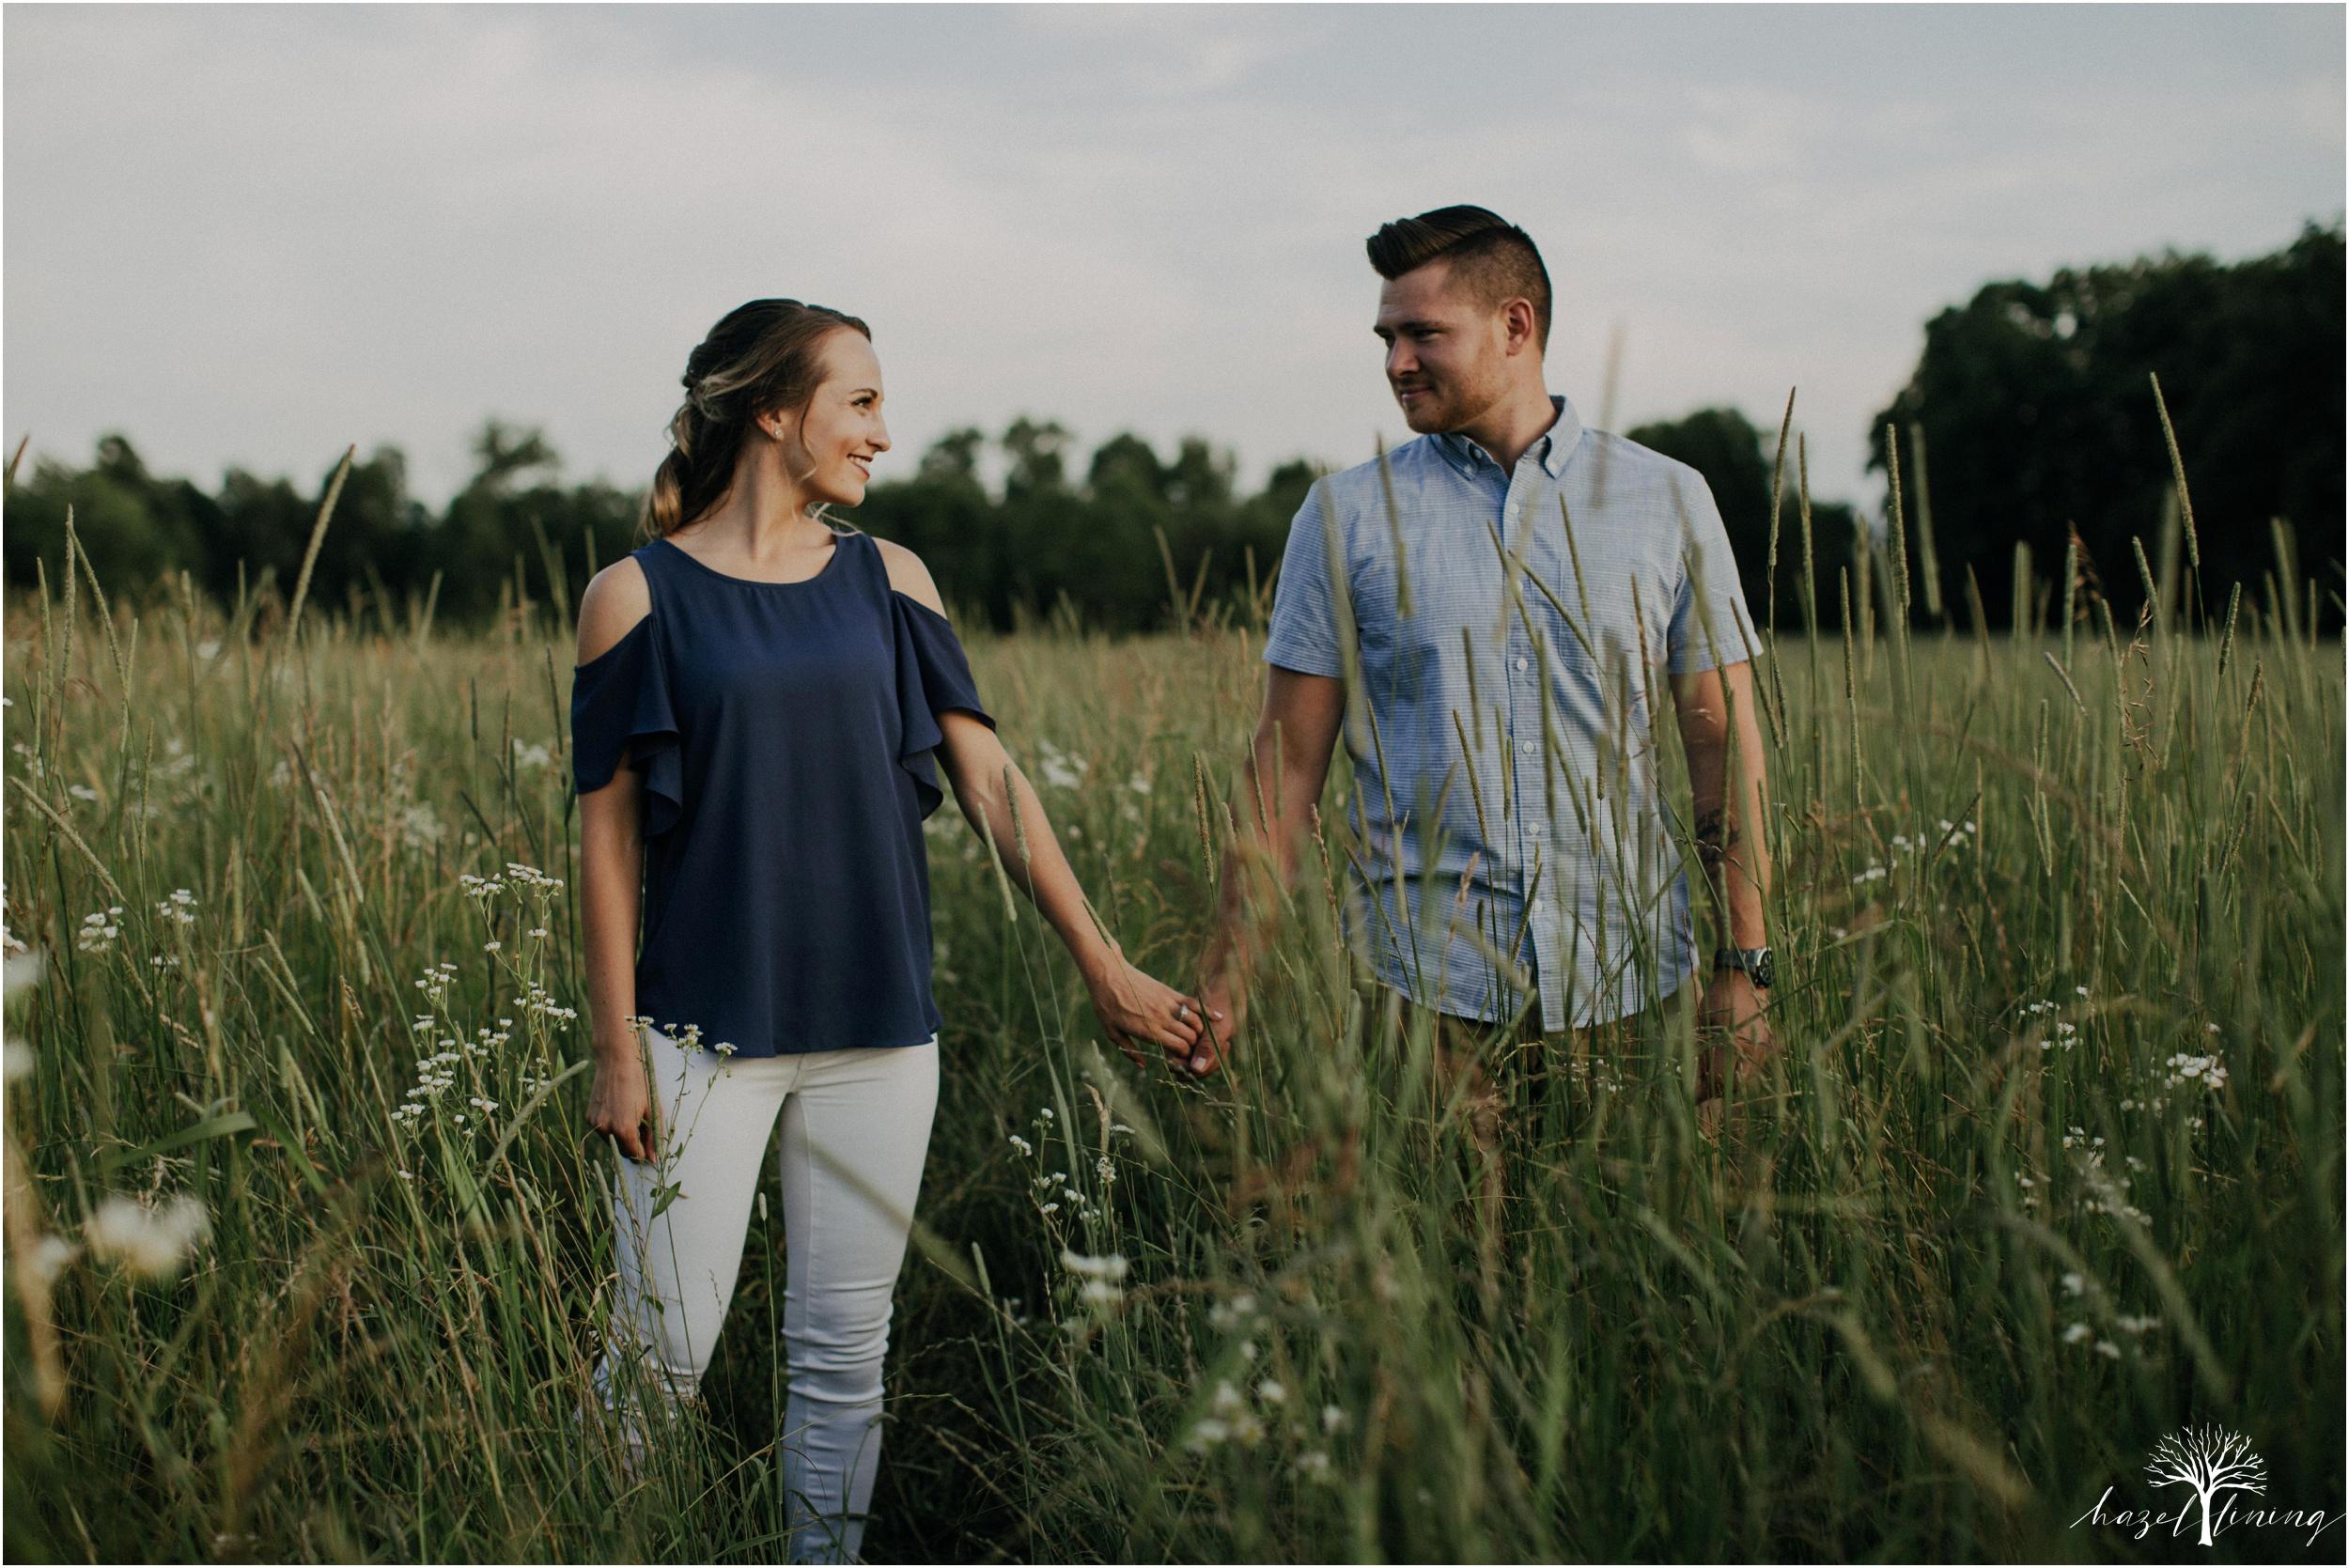 rachel-warner-chris-niedrist-the-farm-bakery-and-events-quakertown-pa-summer-engagement-hazel-lining-photography-destination-elopement-wedding-engagement-photography_0045.jpg